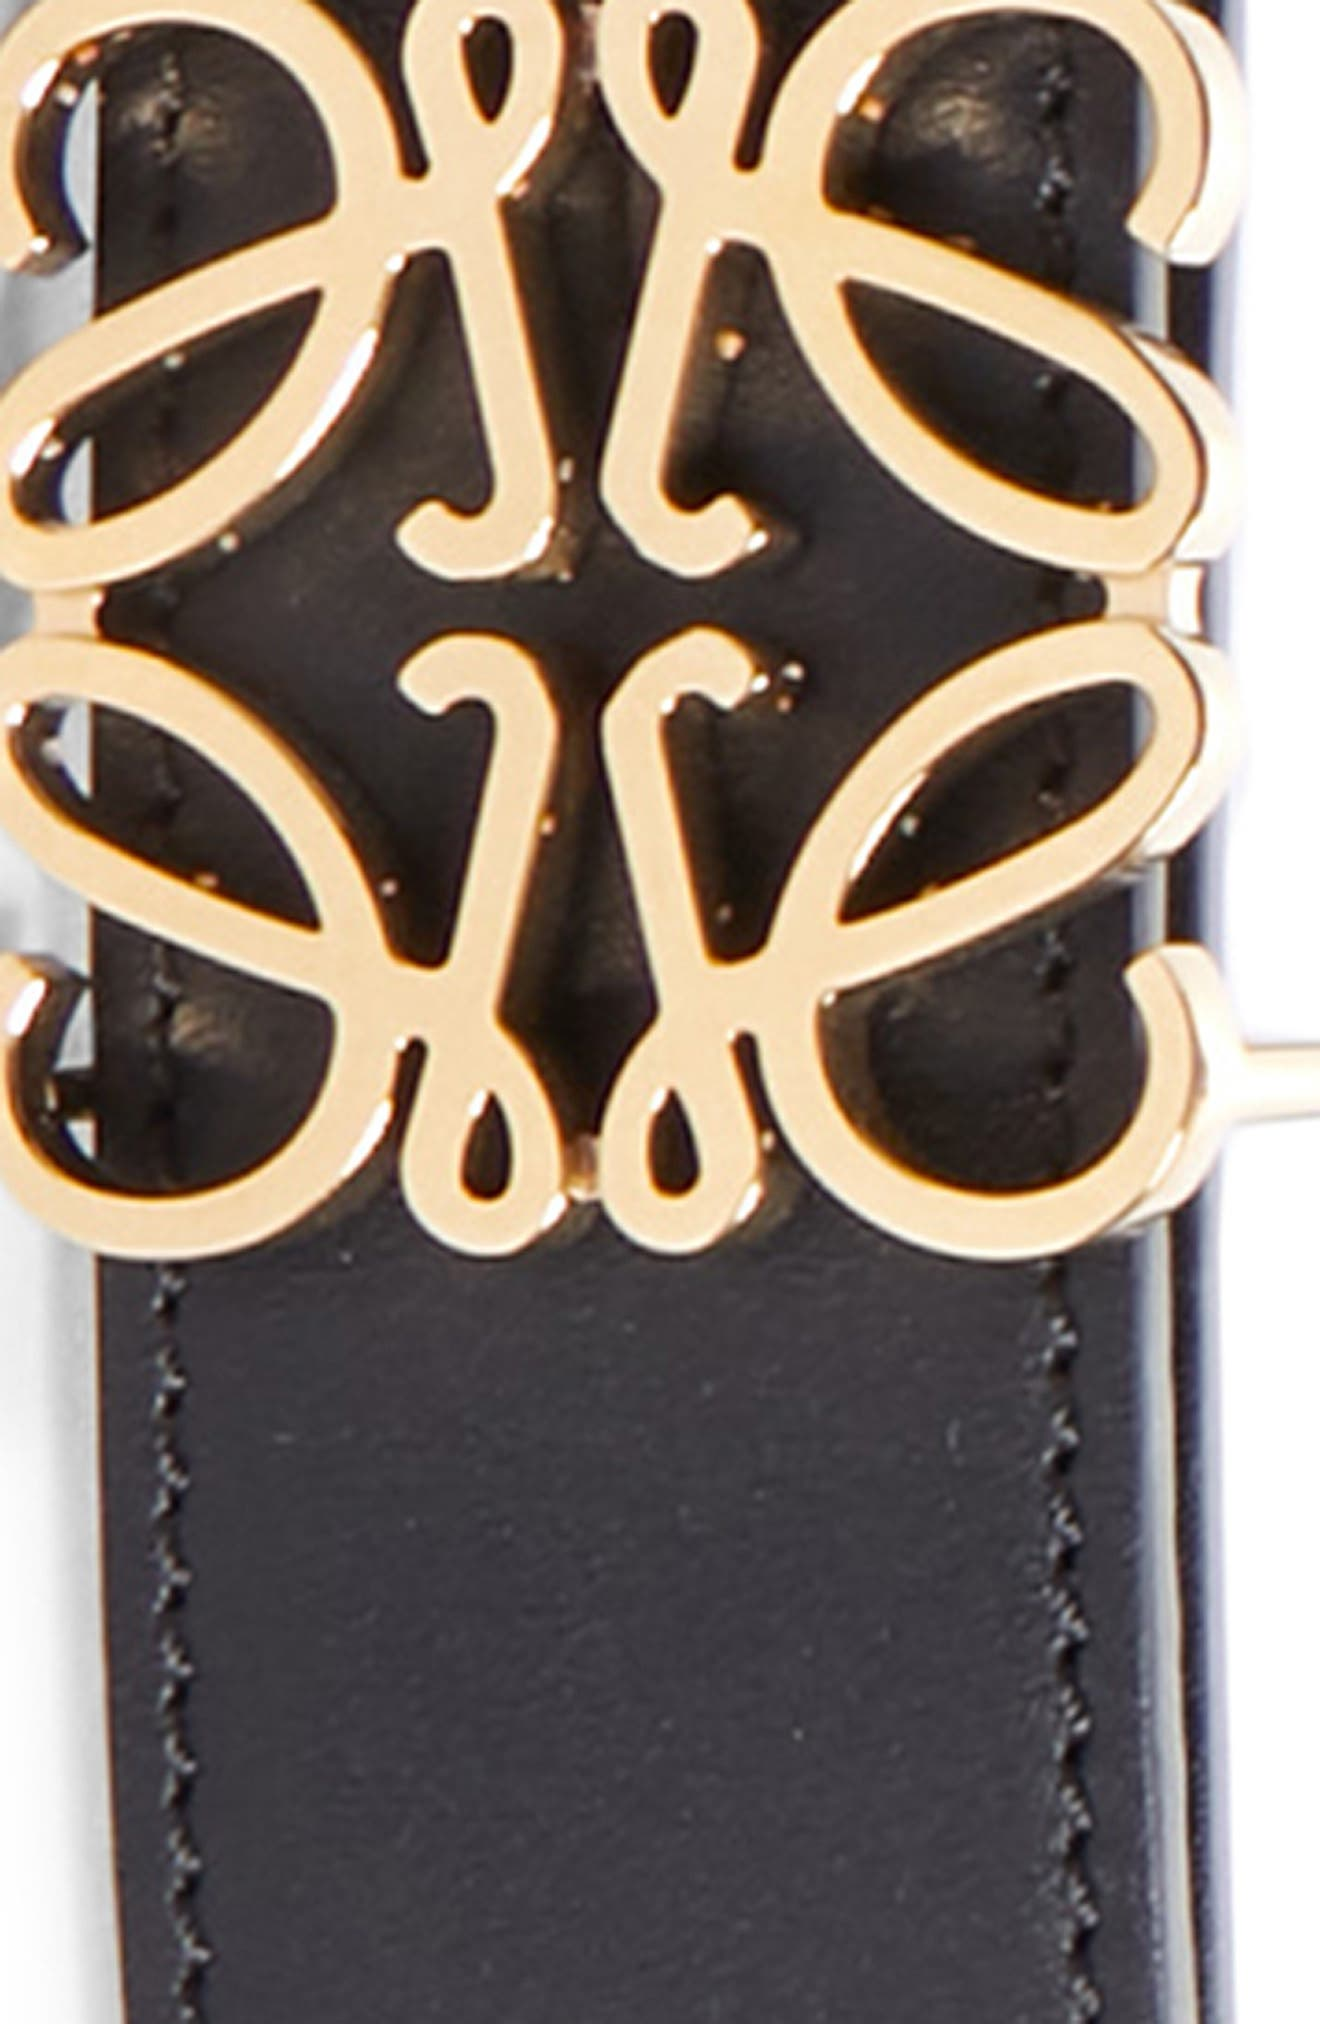 Anagram Logo Calfskin Leather Belt,                             Alternate thumbnail 2, color,                             001